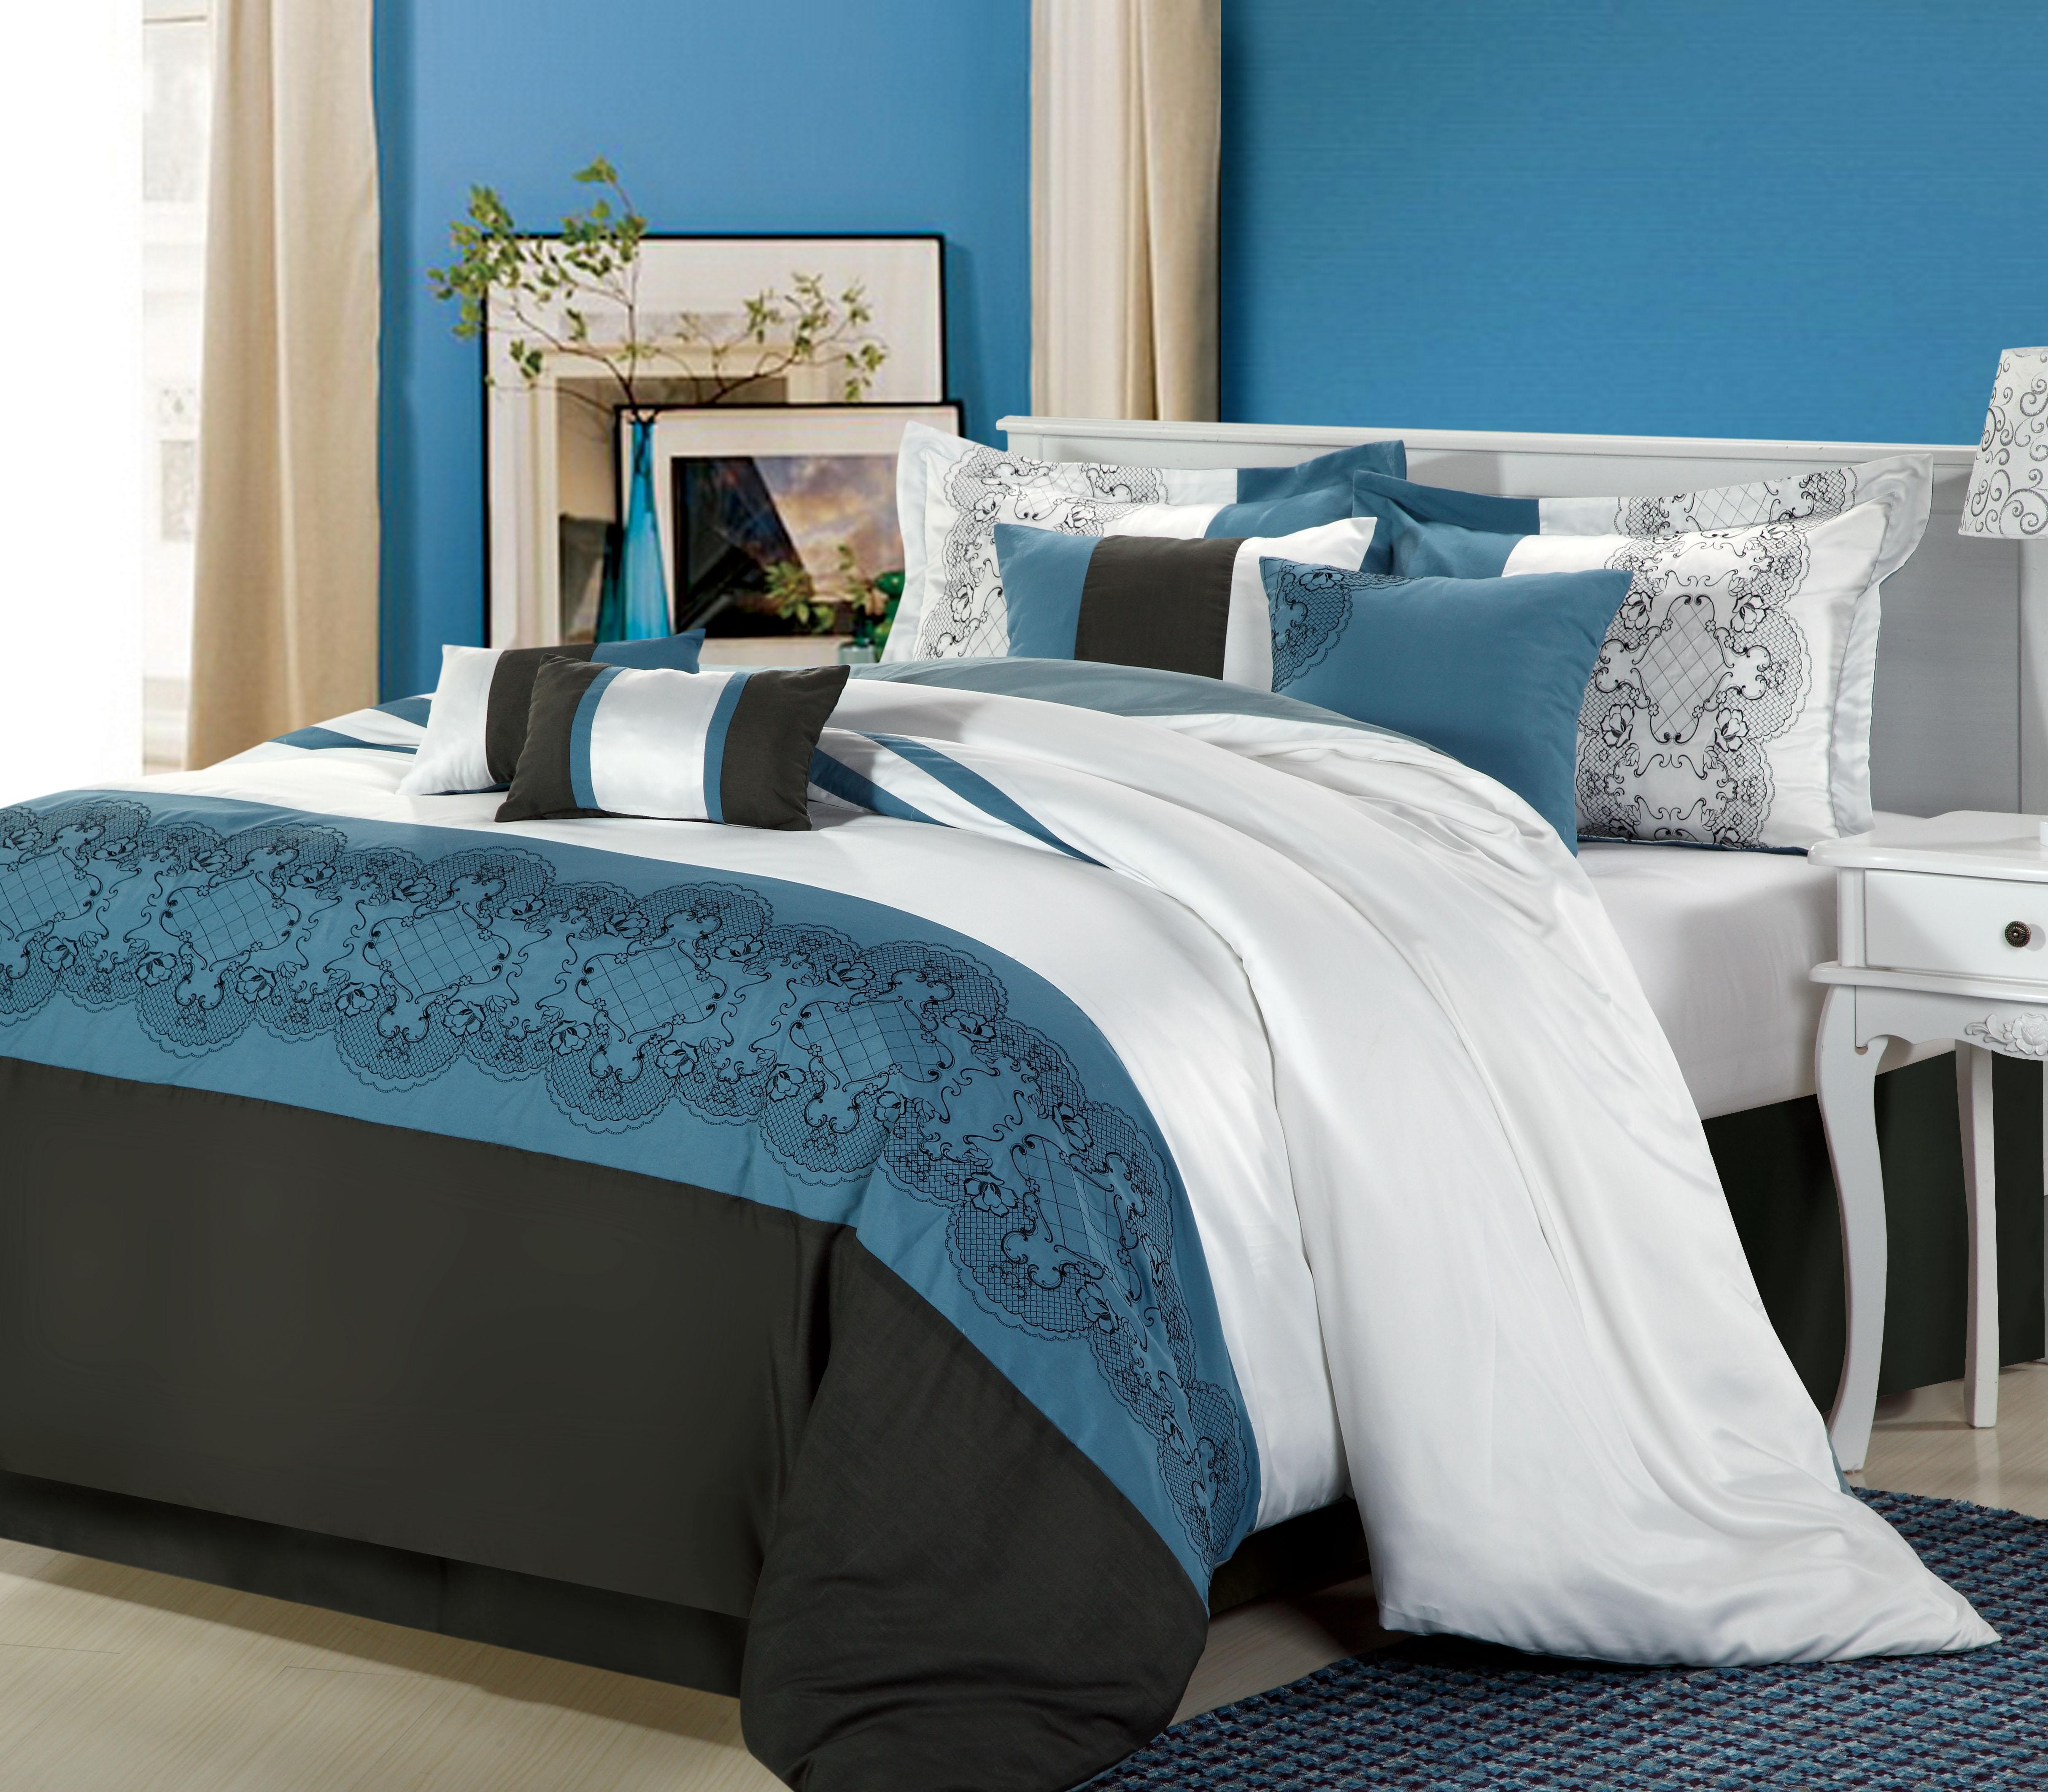 Chic Home Beluga 8-Piece Embroidered Comforter Set, King